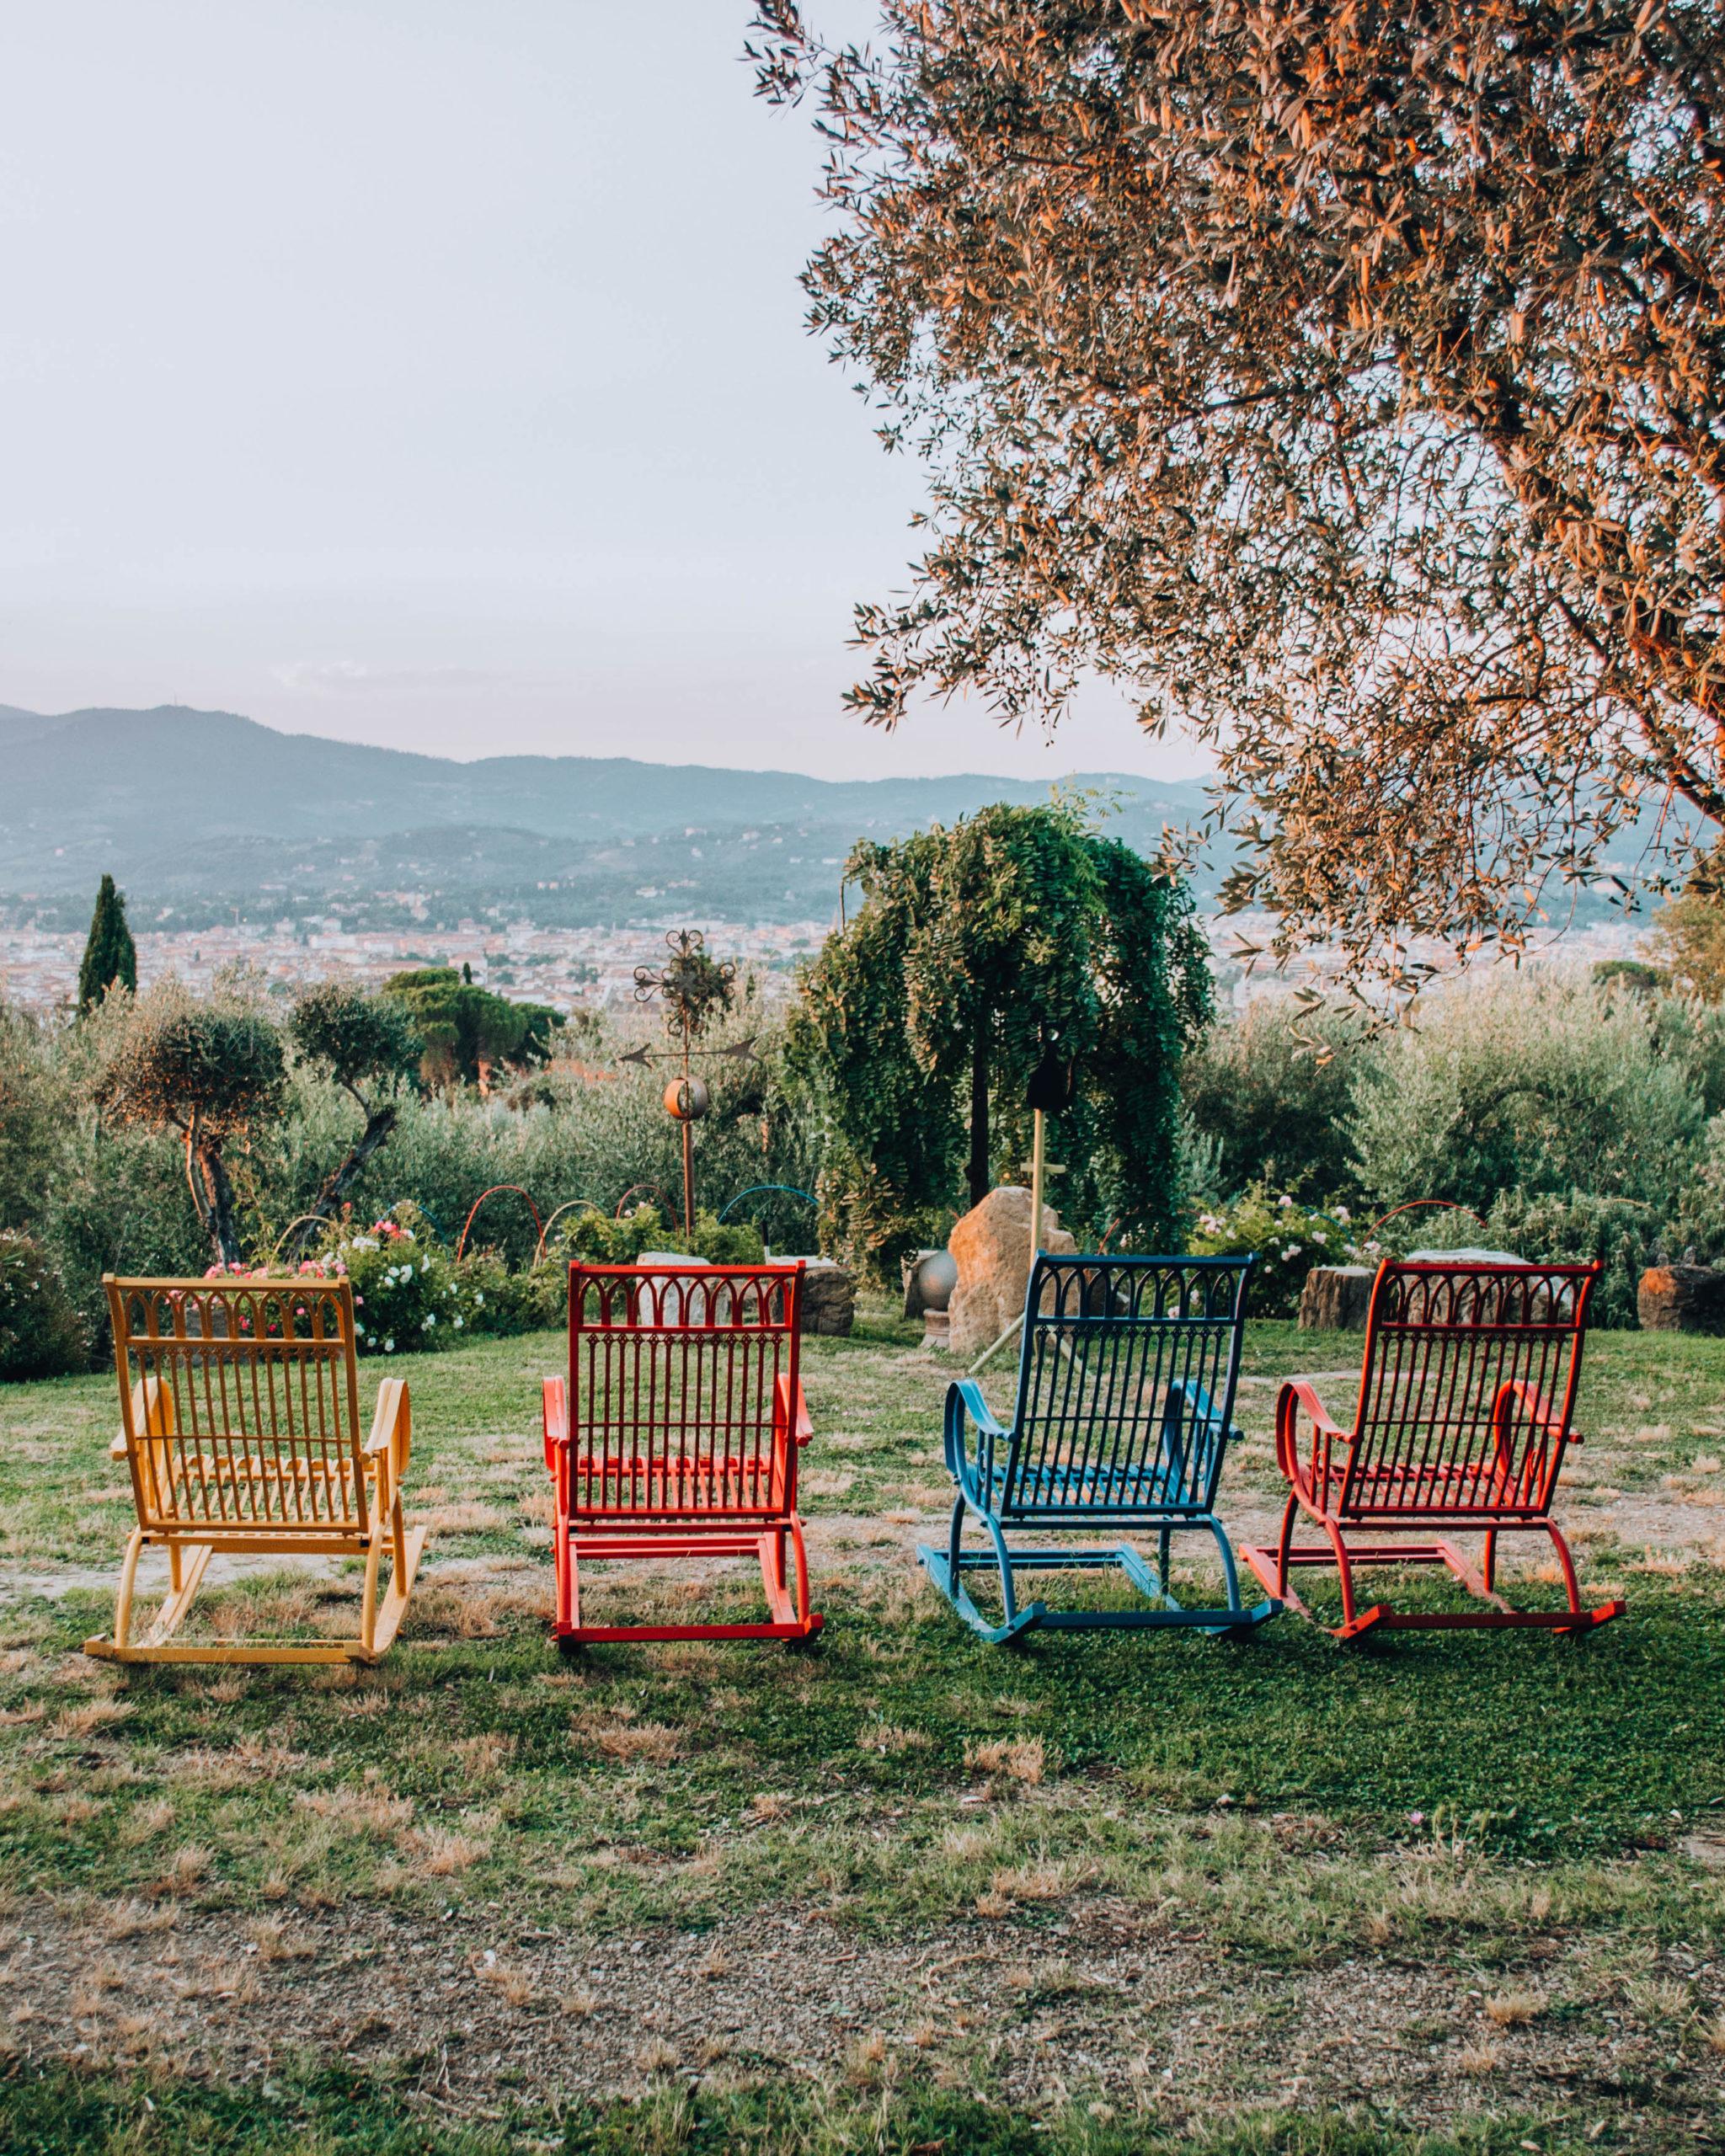 sedute colorate con vista